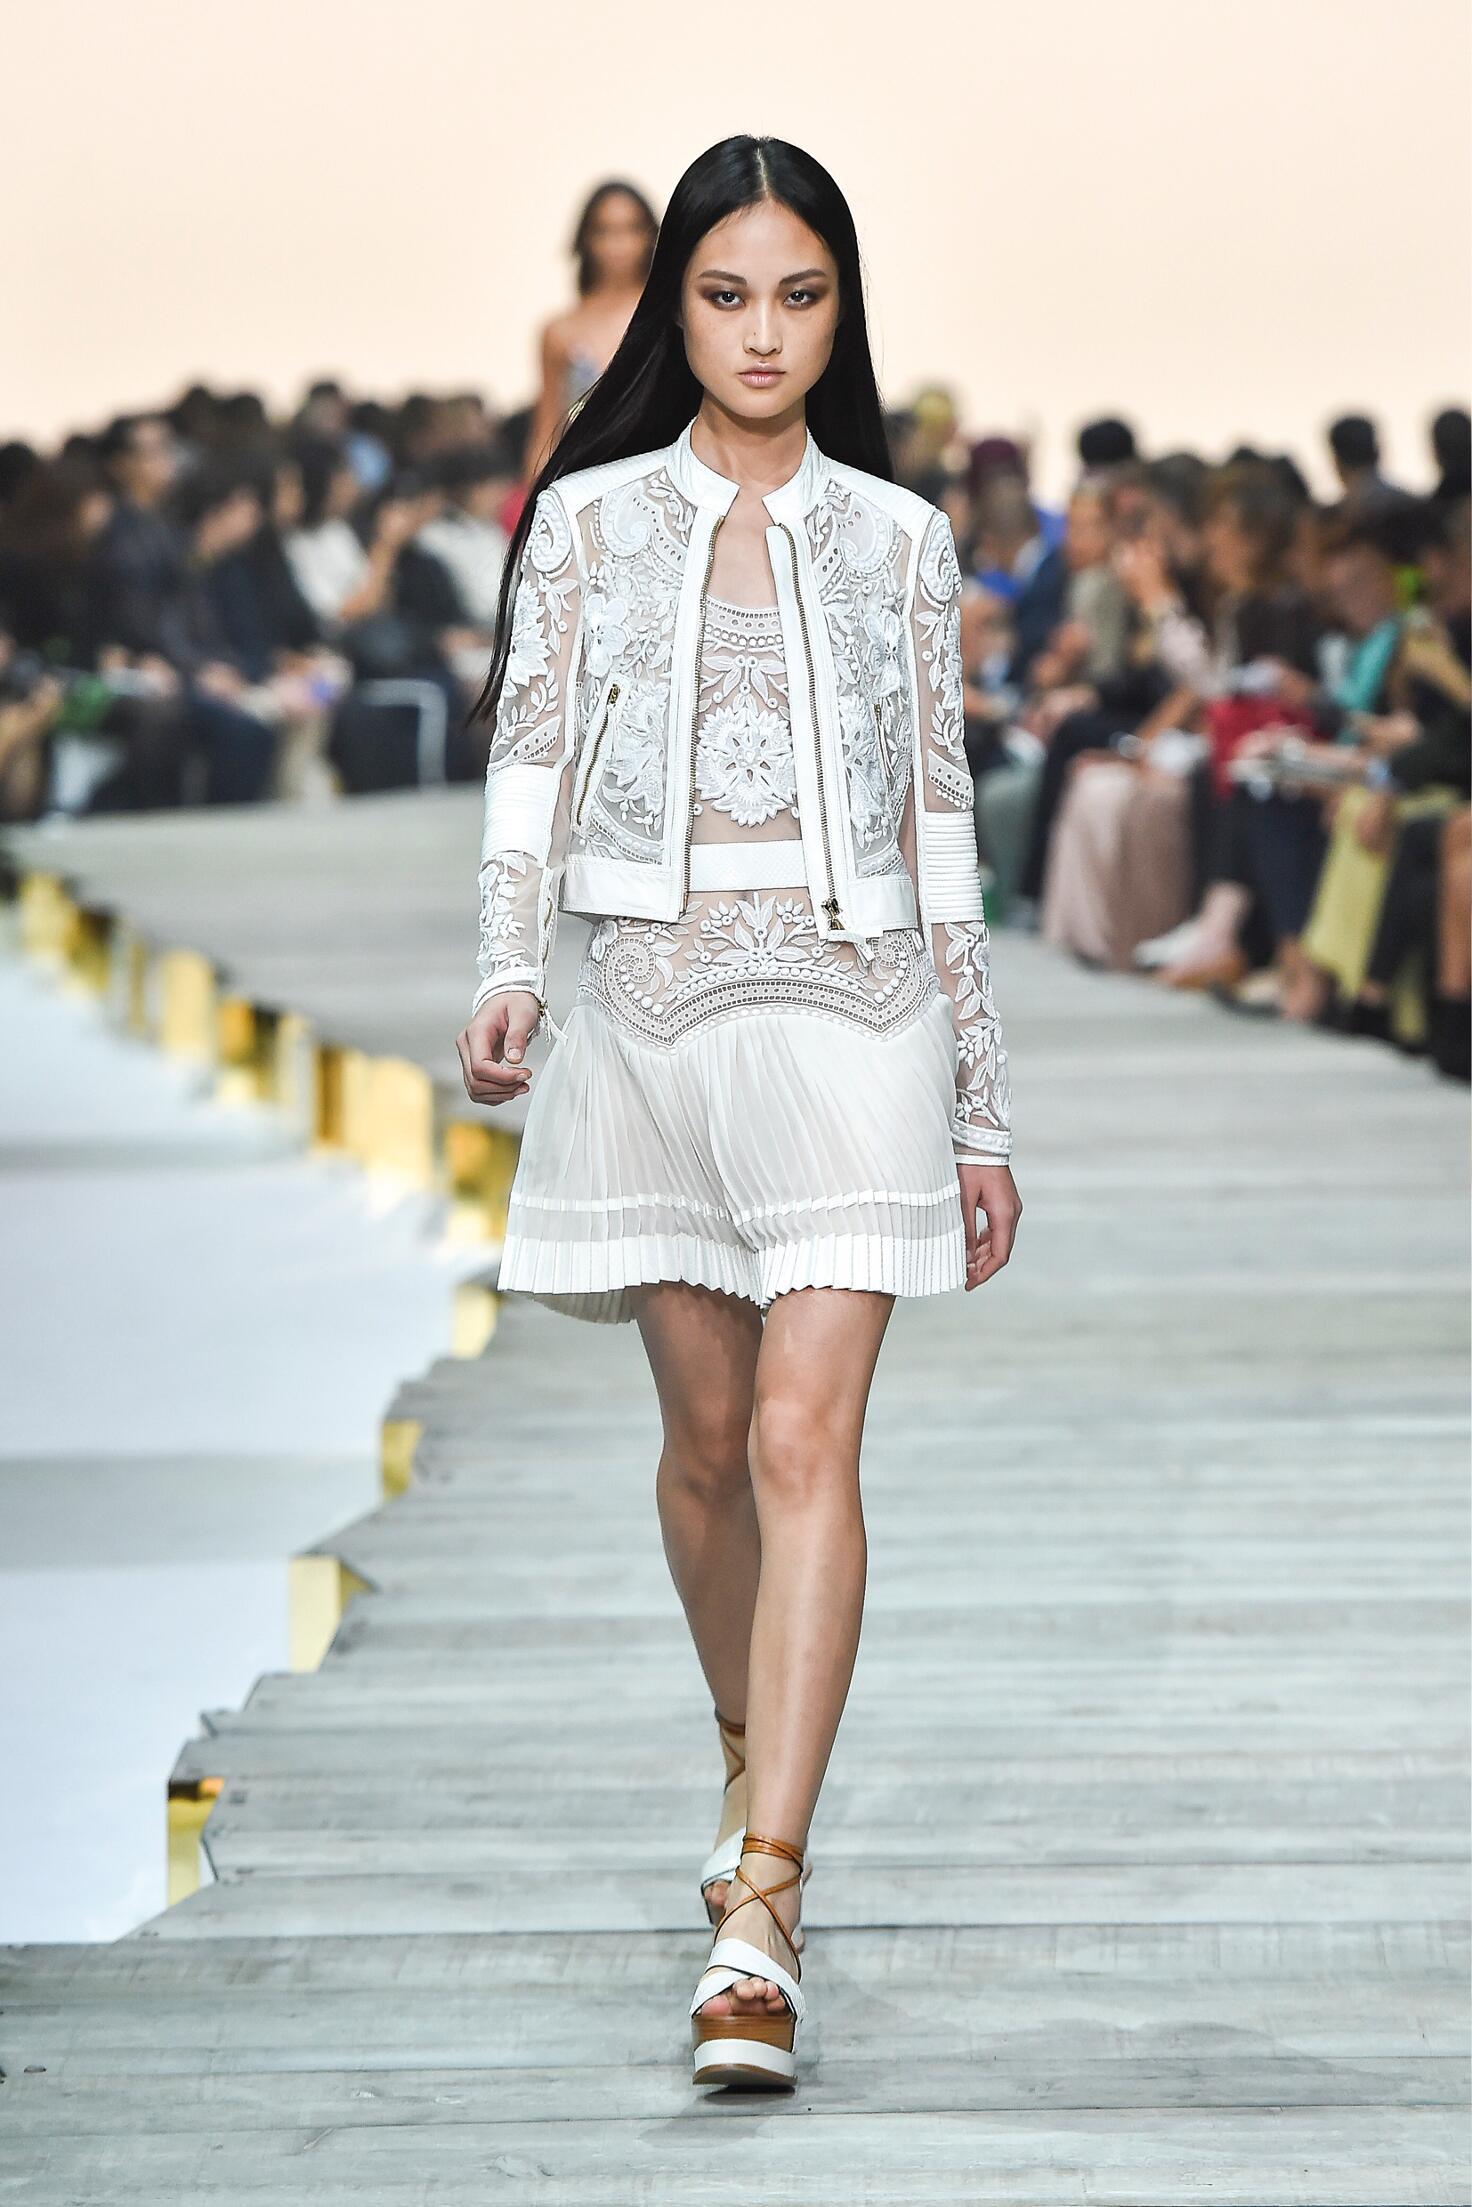 Roberto Cavalli SS 2015 Womenswear